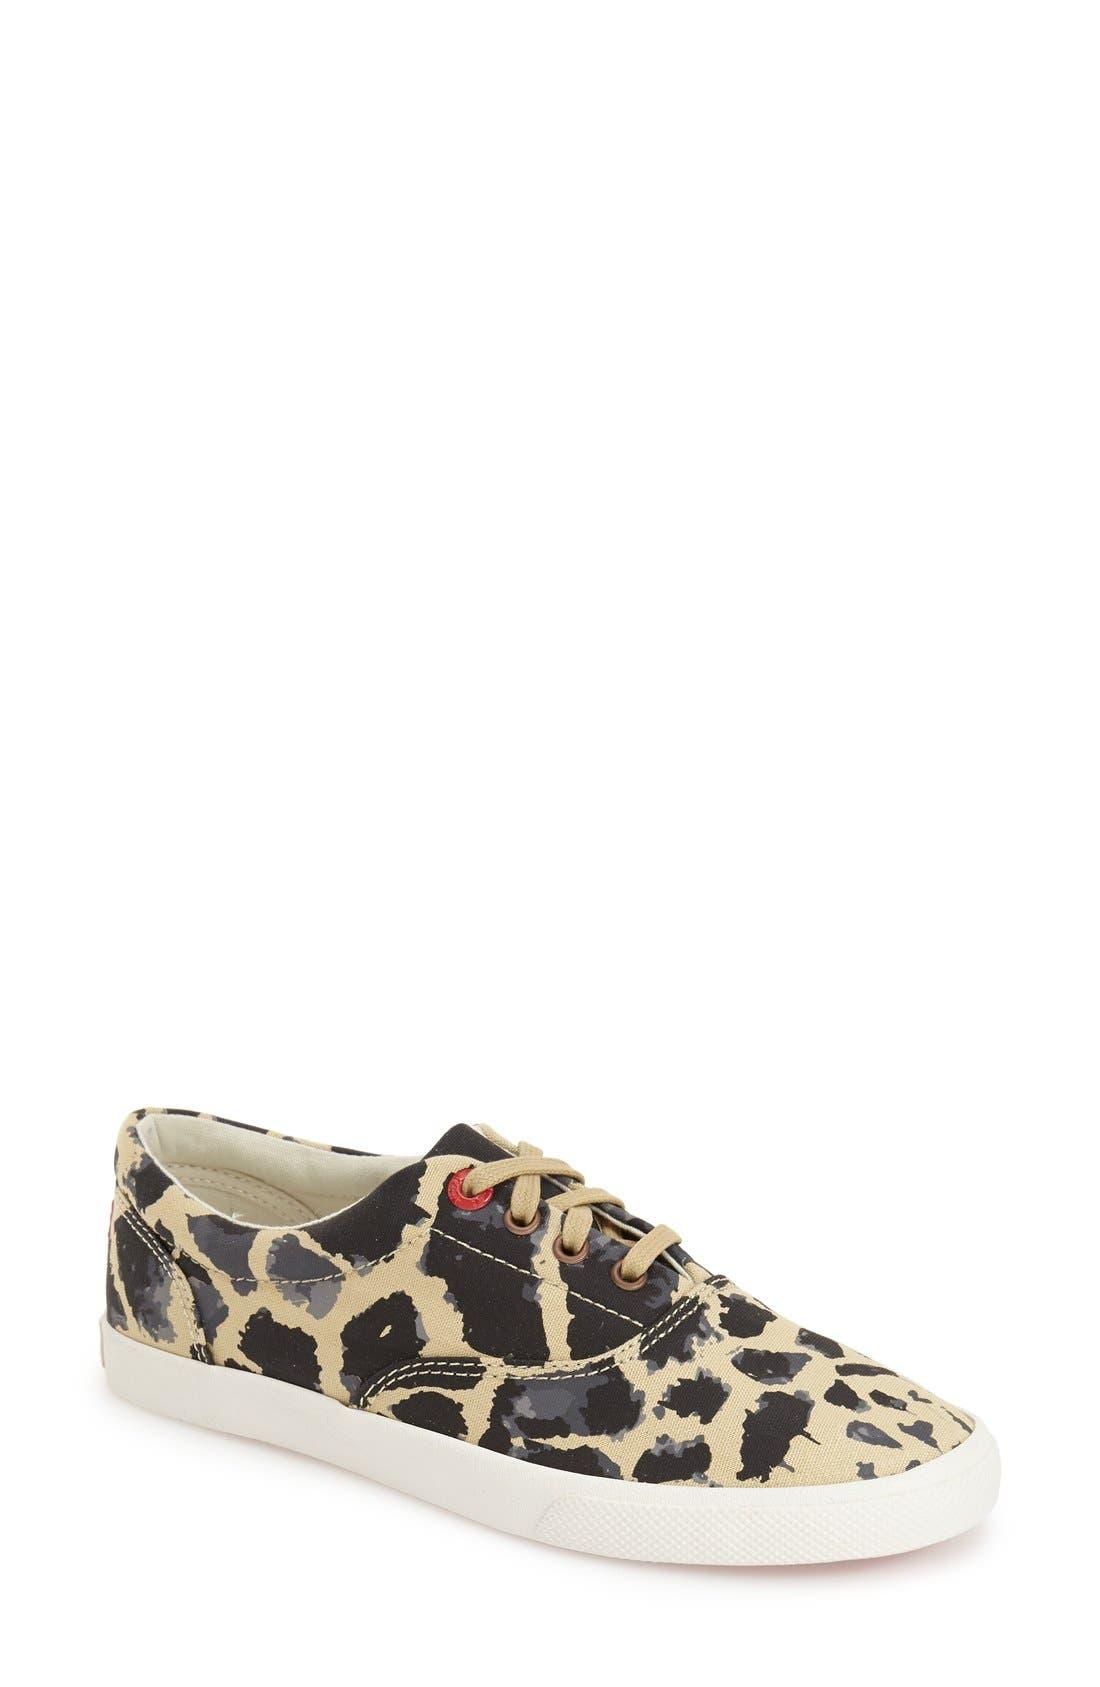 'Giraffe' Sneaker,                             Main thumbnail 1, color,                             005